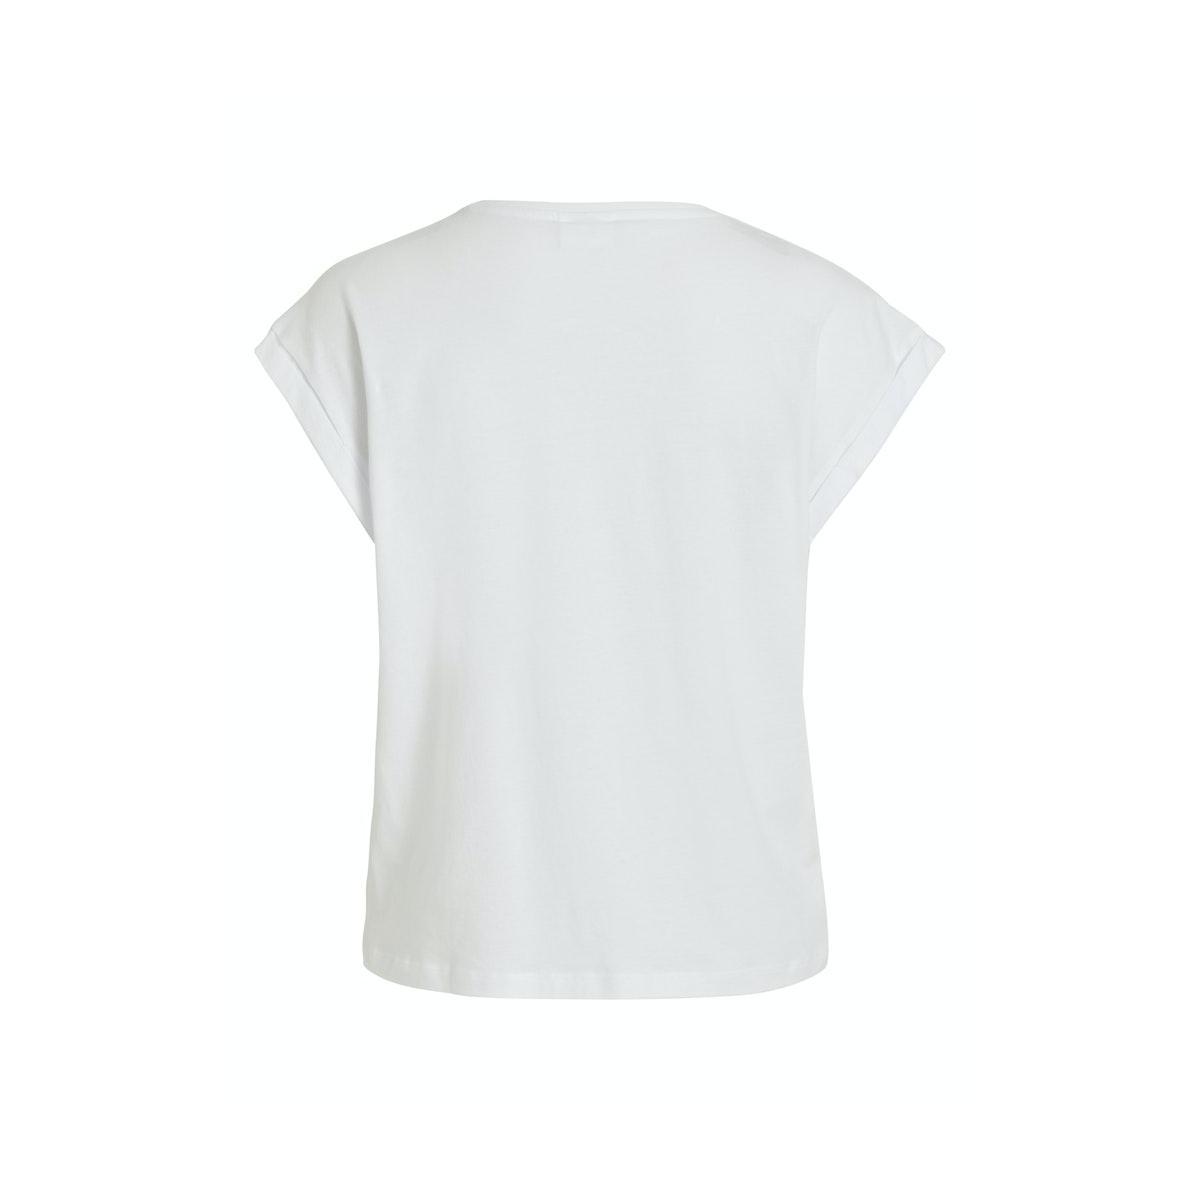 vileta t-shirt 14061716 vila t-shirt optical snow